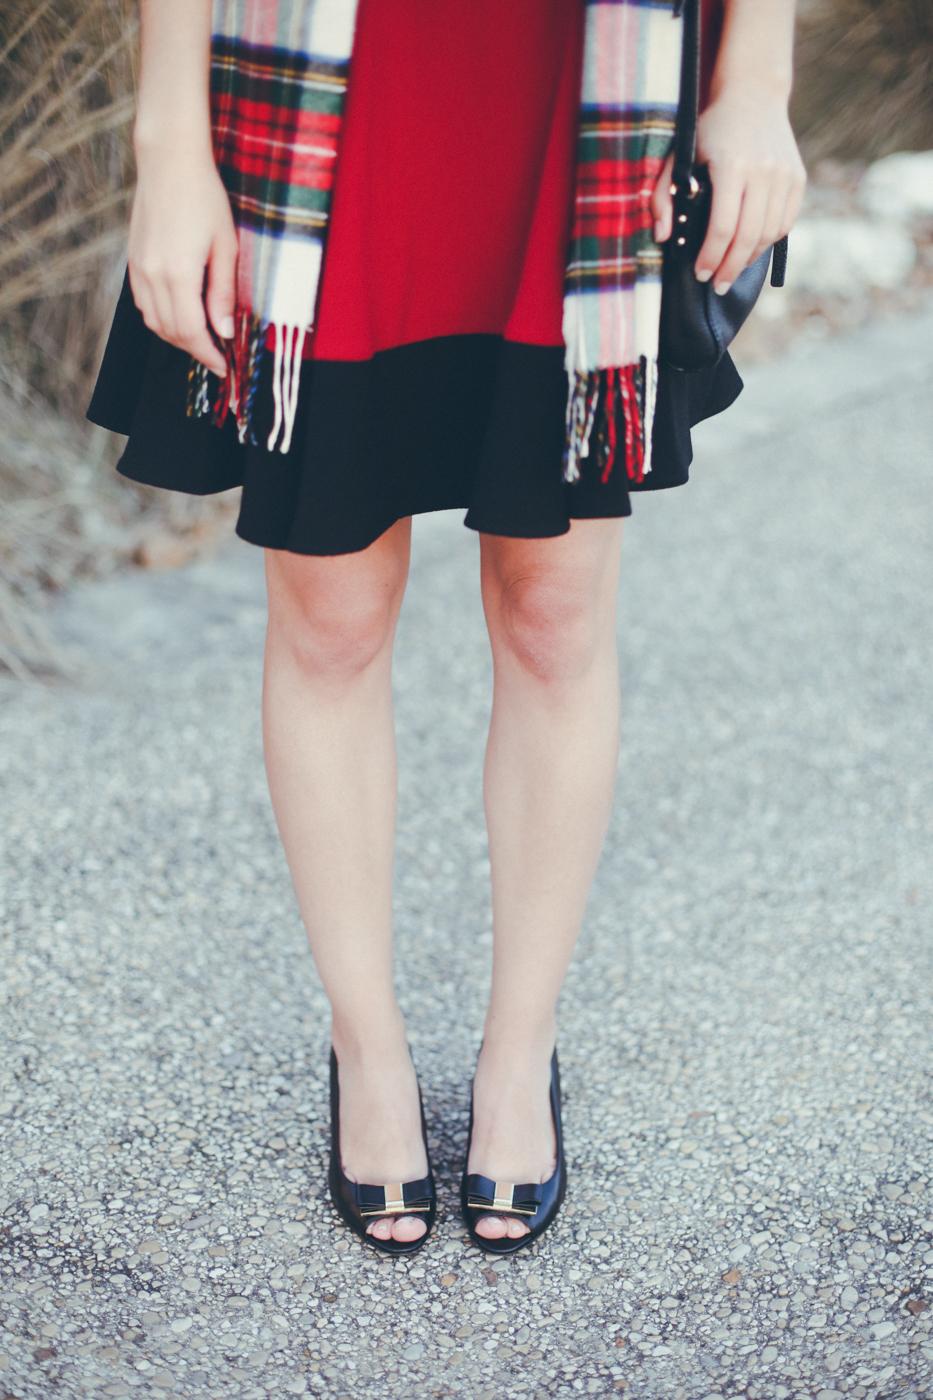 austin texas, austin fashion blog, austin fashion blogger, austin fashion, austin fashion blog, pinterest outfit, off the shoulder dress, austin style, austin style blog, austin style blogger, austin style bloggers, style bloggers, red dress, winter outfit ideas, holiday outfit ideas